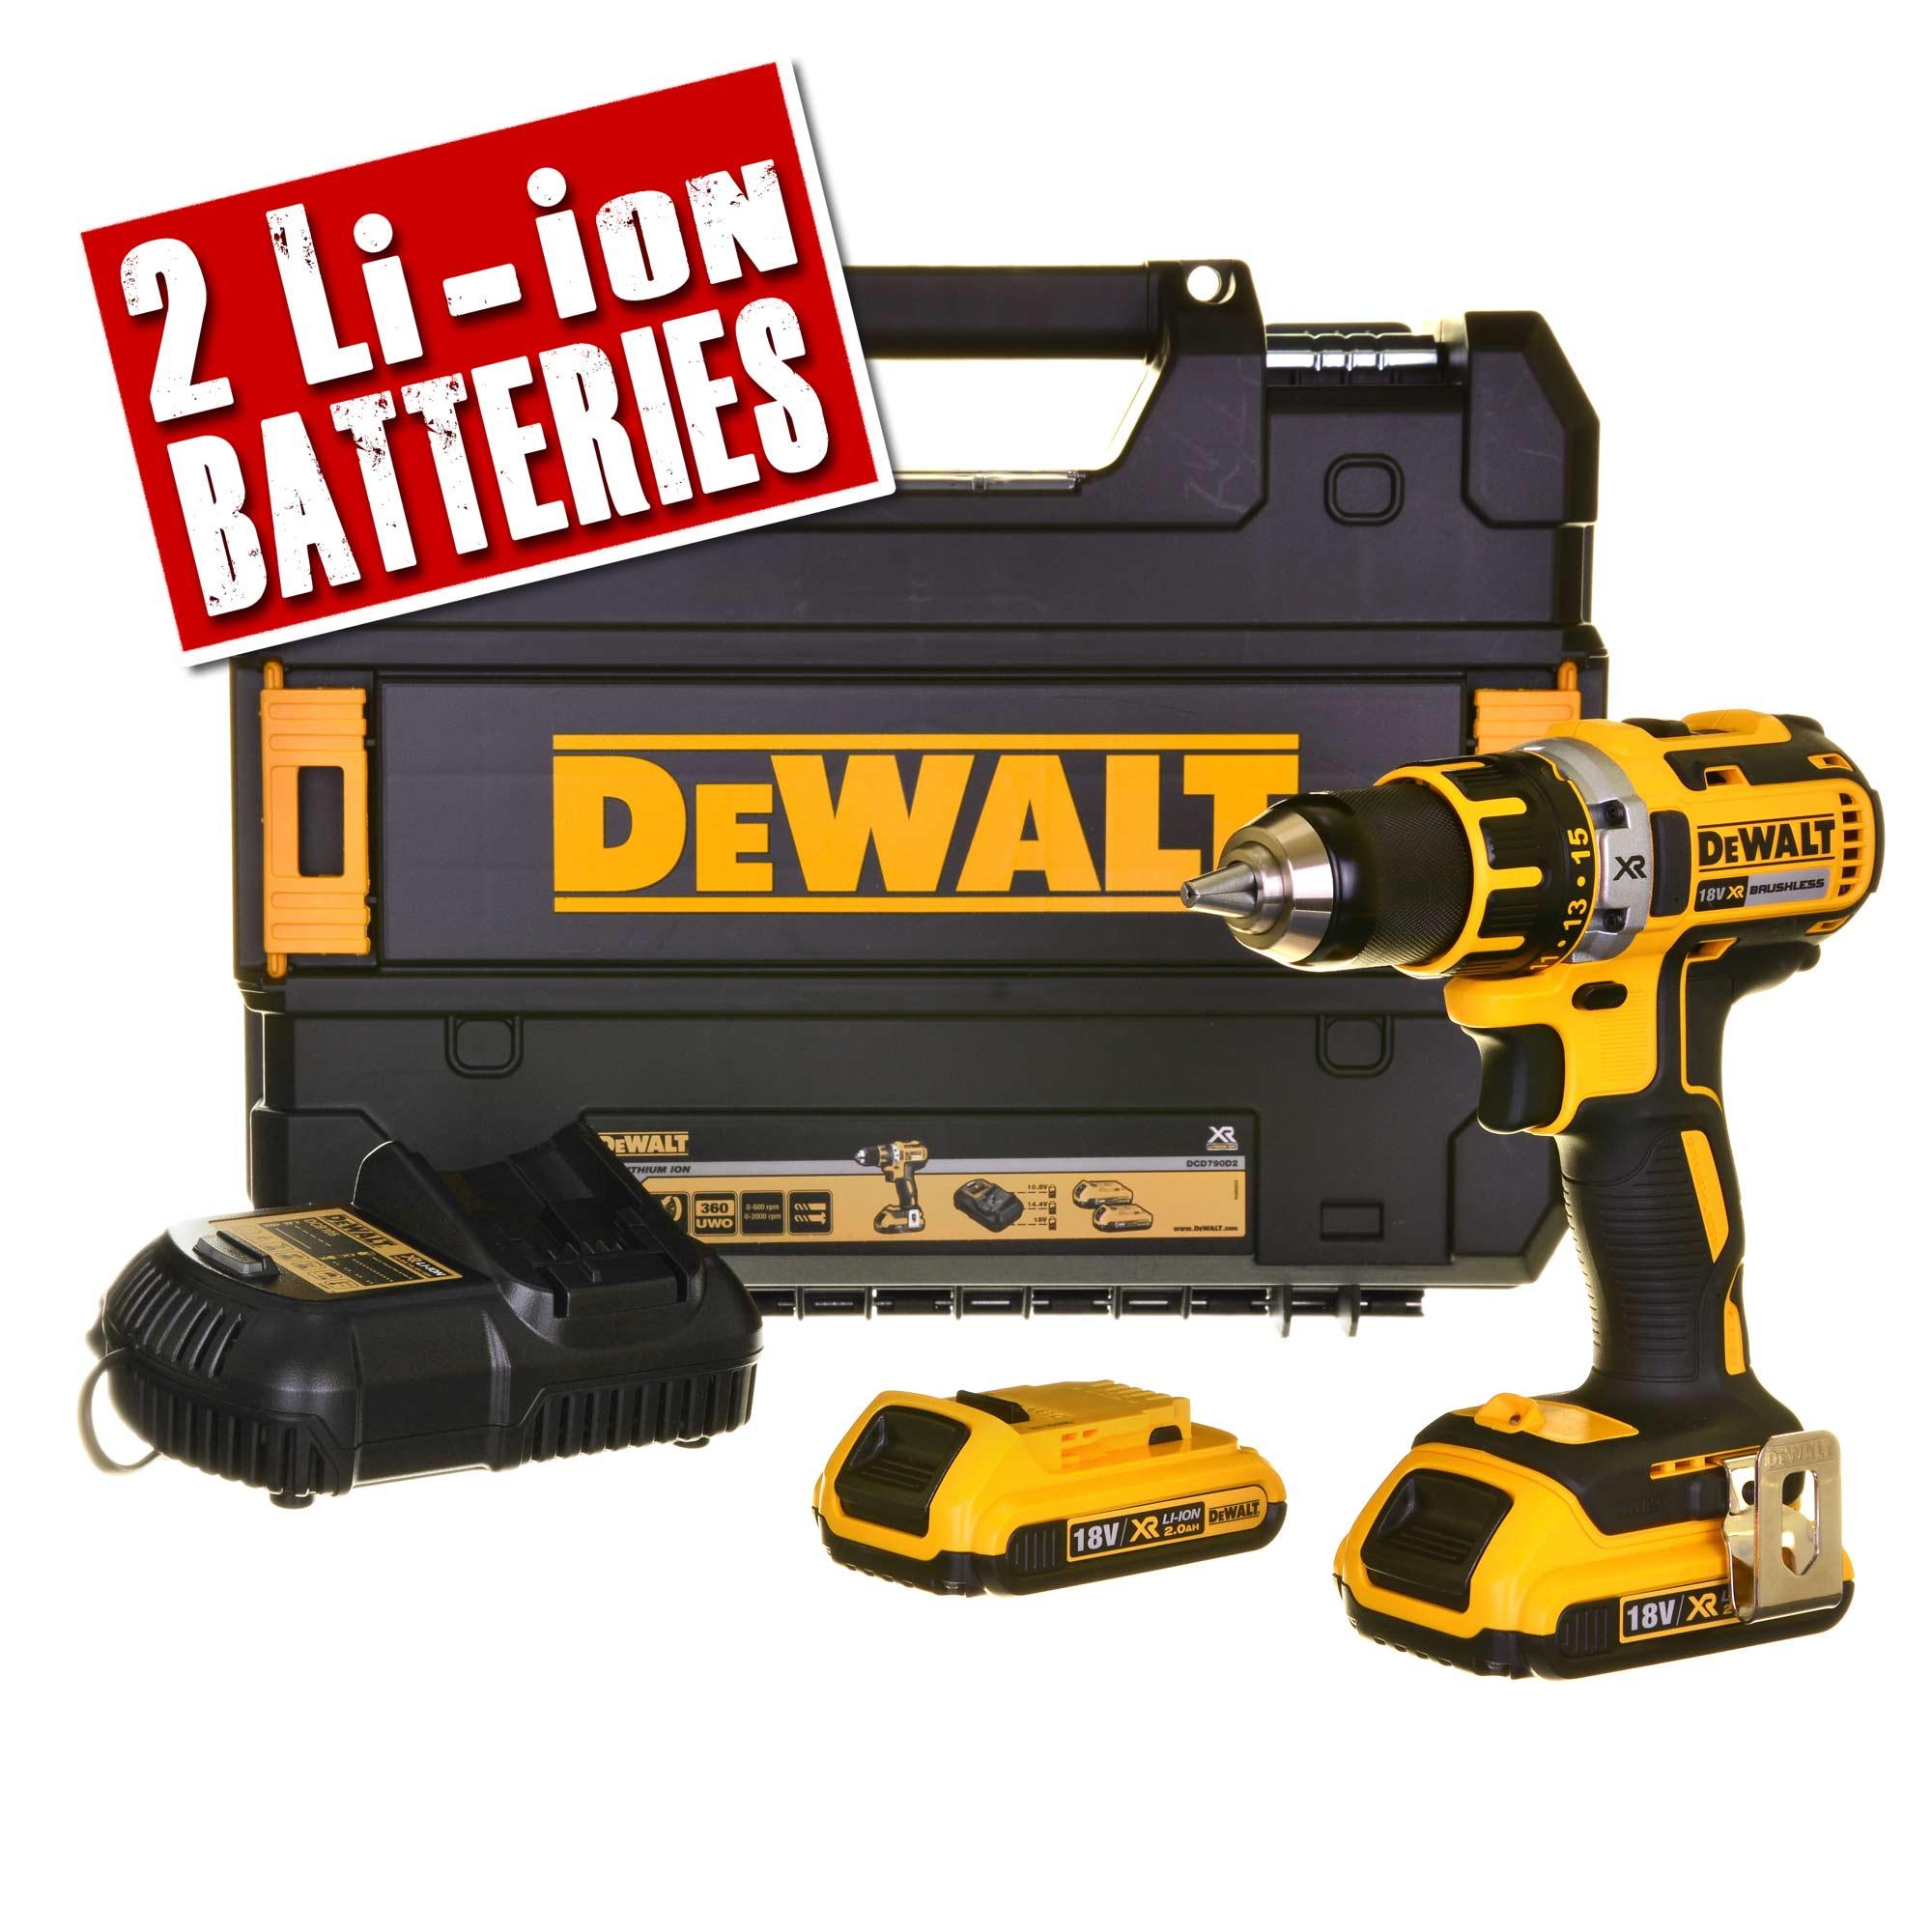 Dewalt DCD790D2 18v XR Brushless Drill/Driver £119.99 @ ITS